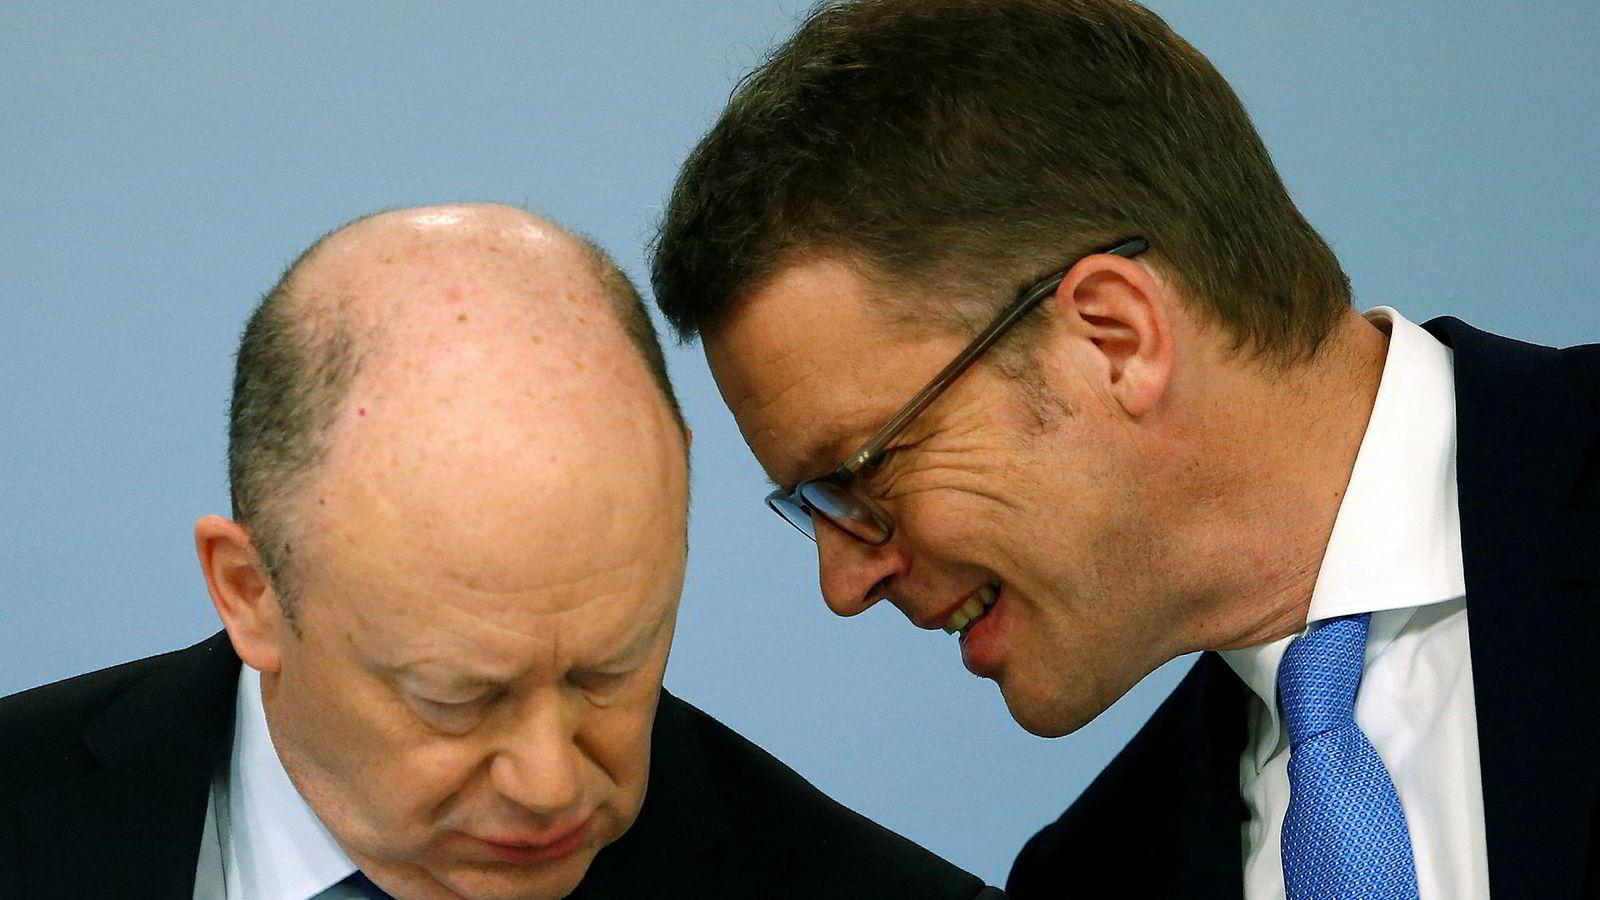 Nåværende konsernsjef Christian Sewing (t.h) i prat med tidligere Deutsche Bank-sjef John Cryan. Sistnevntes avgang i april i fjor kostet banken over 100 millioner kroner alene.